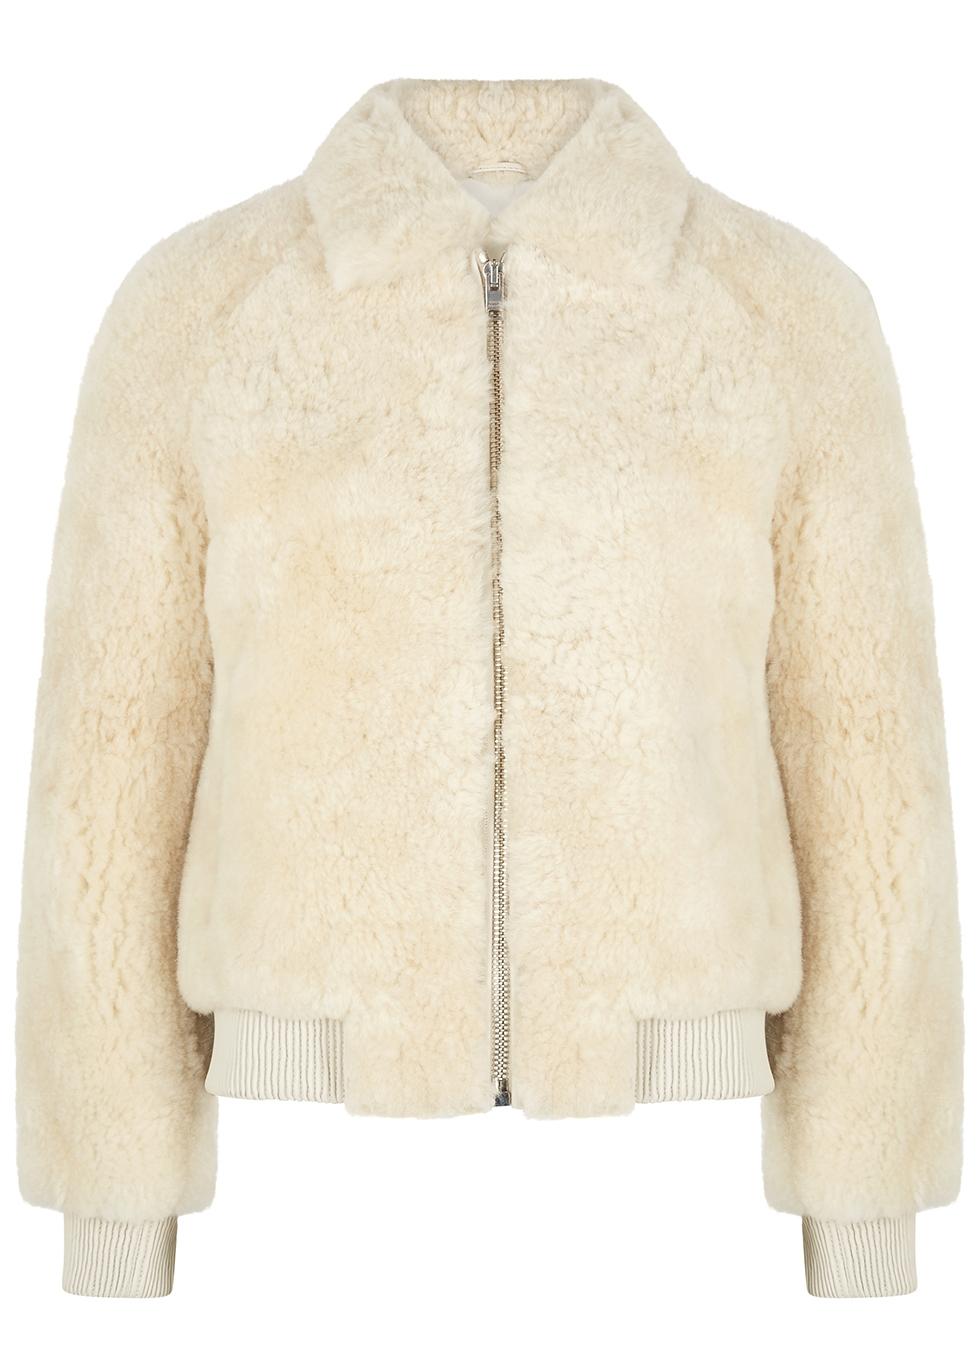 5b206169e233 Women's Designer Jackets - Harvey Nichols